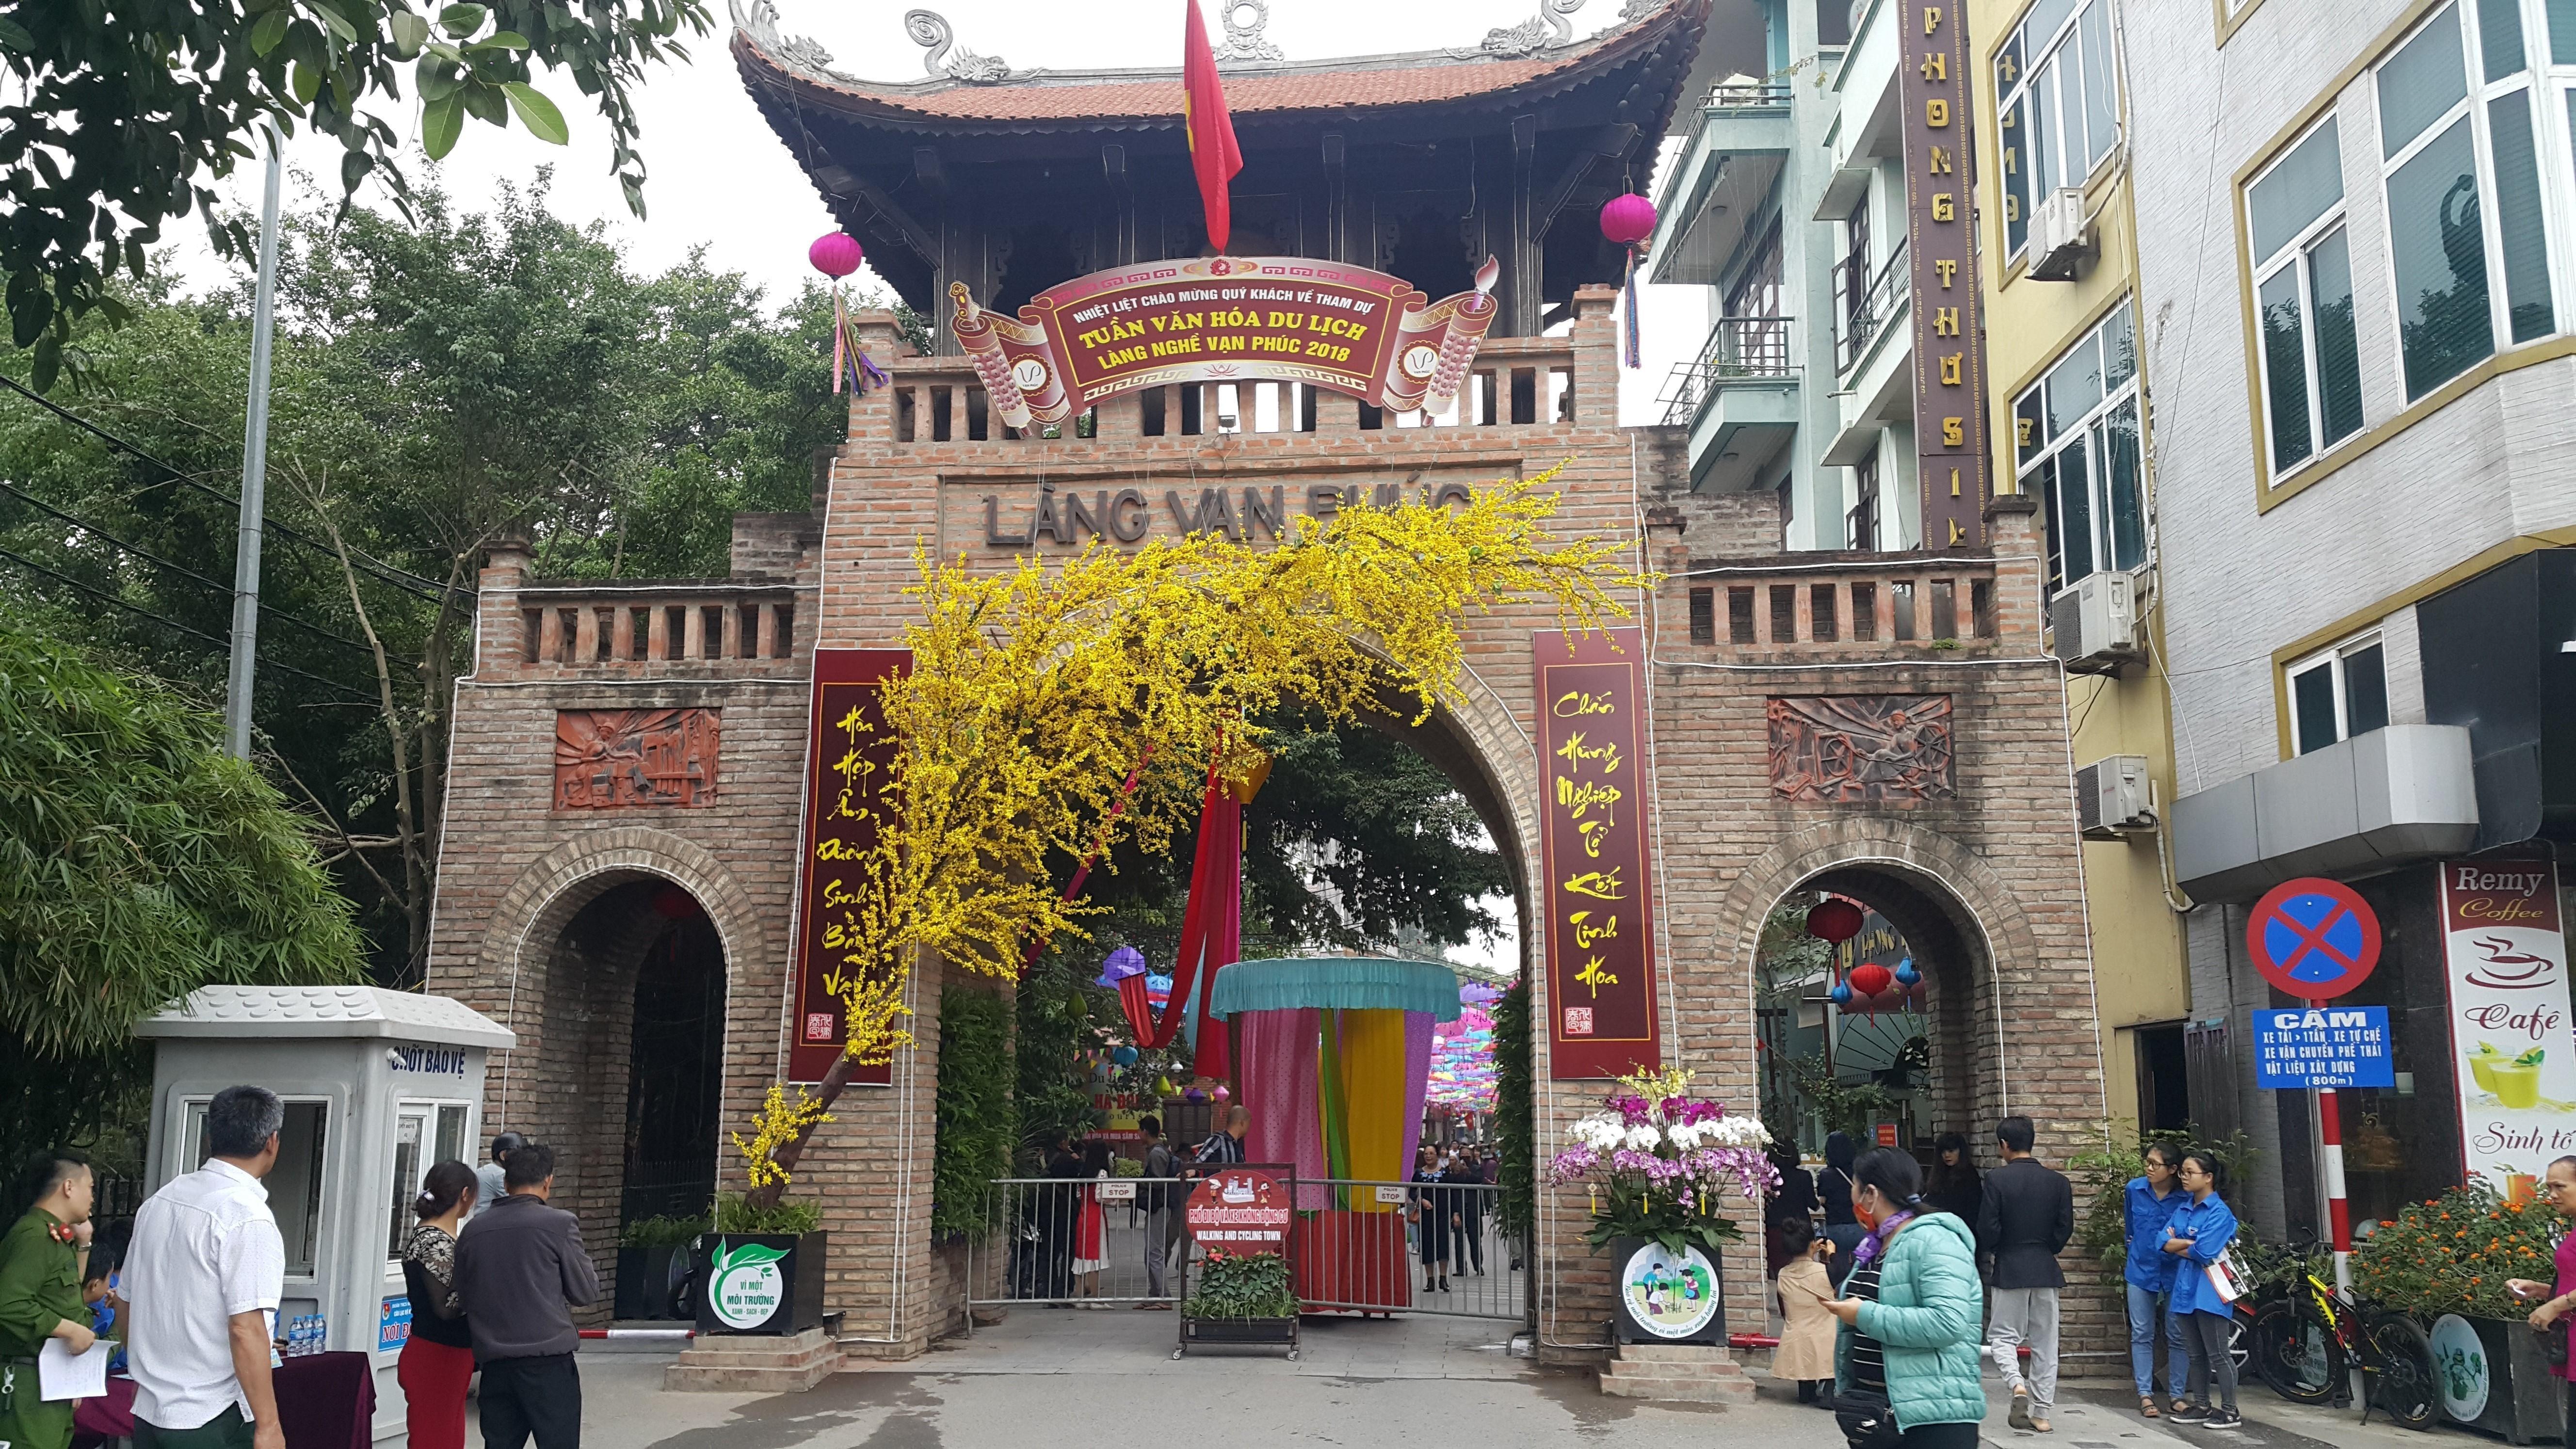 https://cdnimg.vietnamplus.vn/Uploaded/lepz/2019_10_02/ttxvnvanphuc.jpg